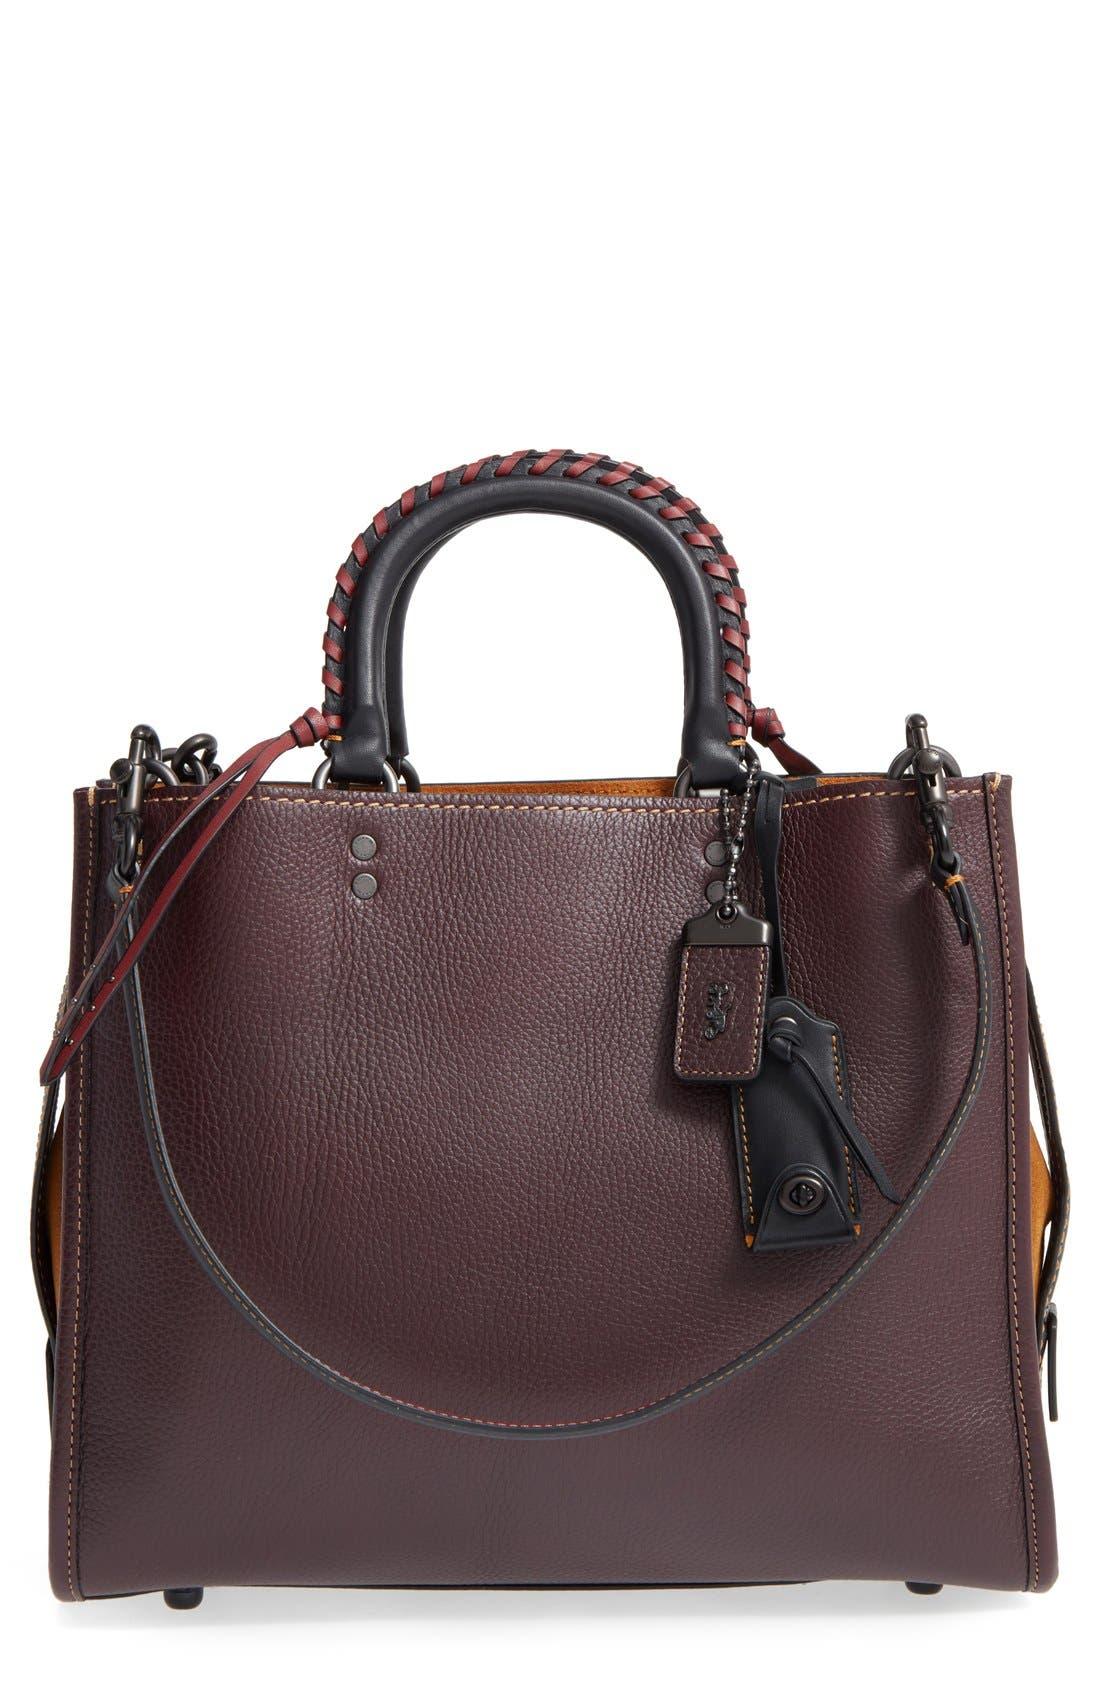 COACH 1941 Embellished Handle Rogue Leather Satchel